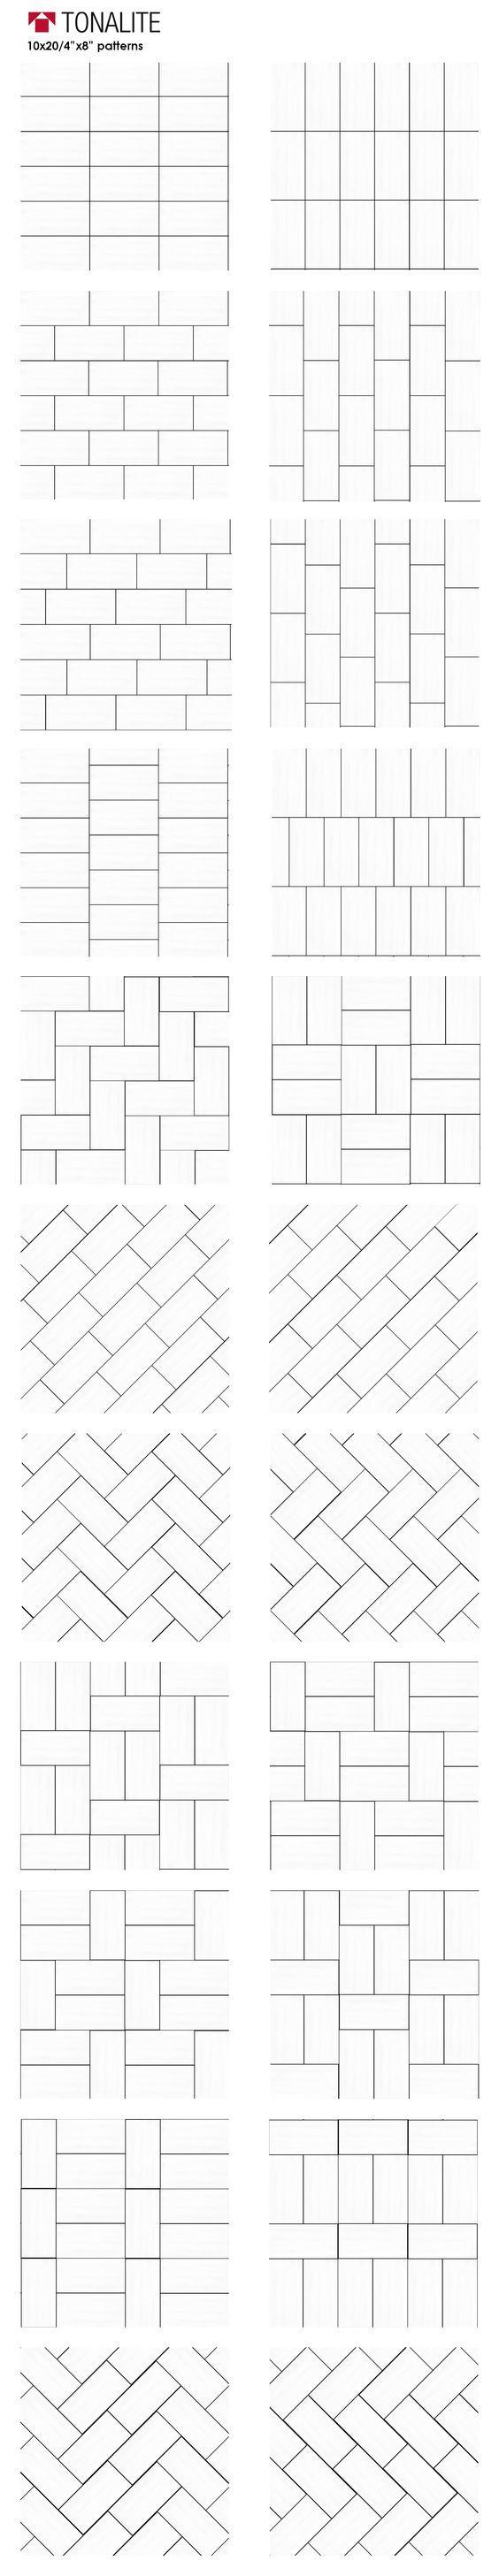 Backsplash tile layout